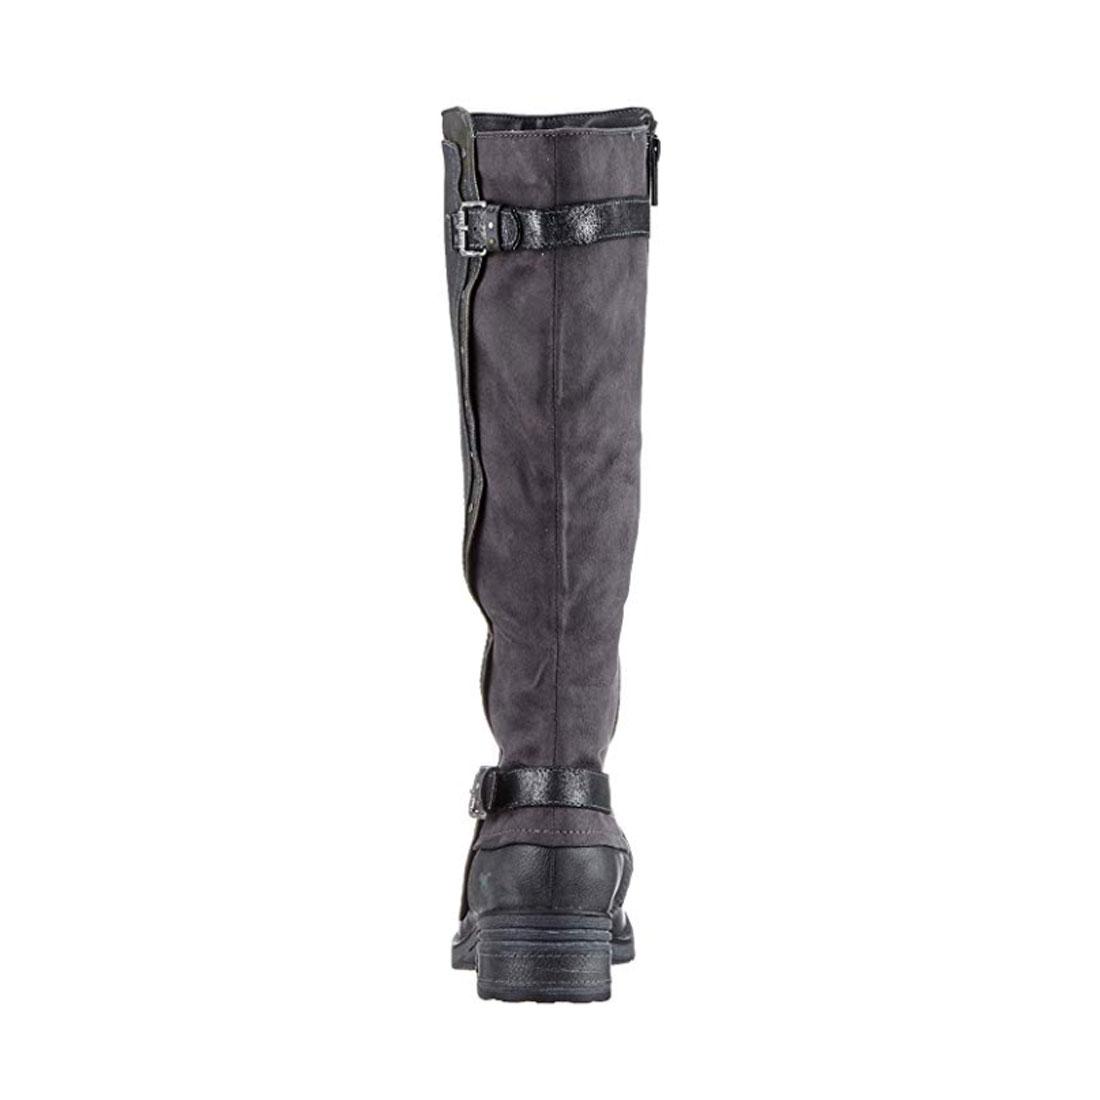 Mustang Damen Stiefel True Denim Biker Boots Schuhe antrahzit grau